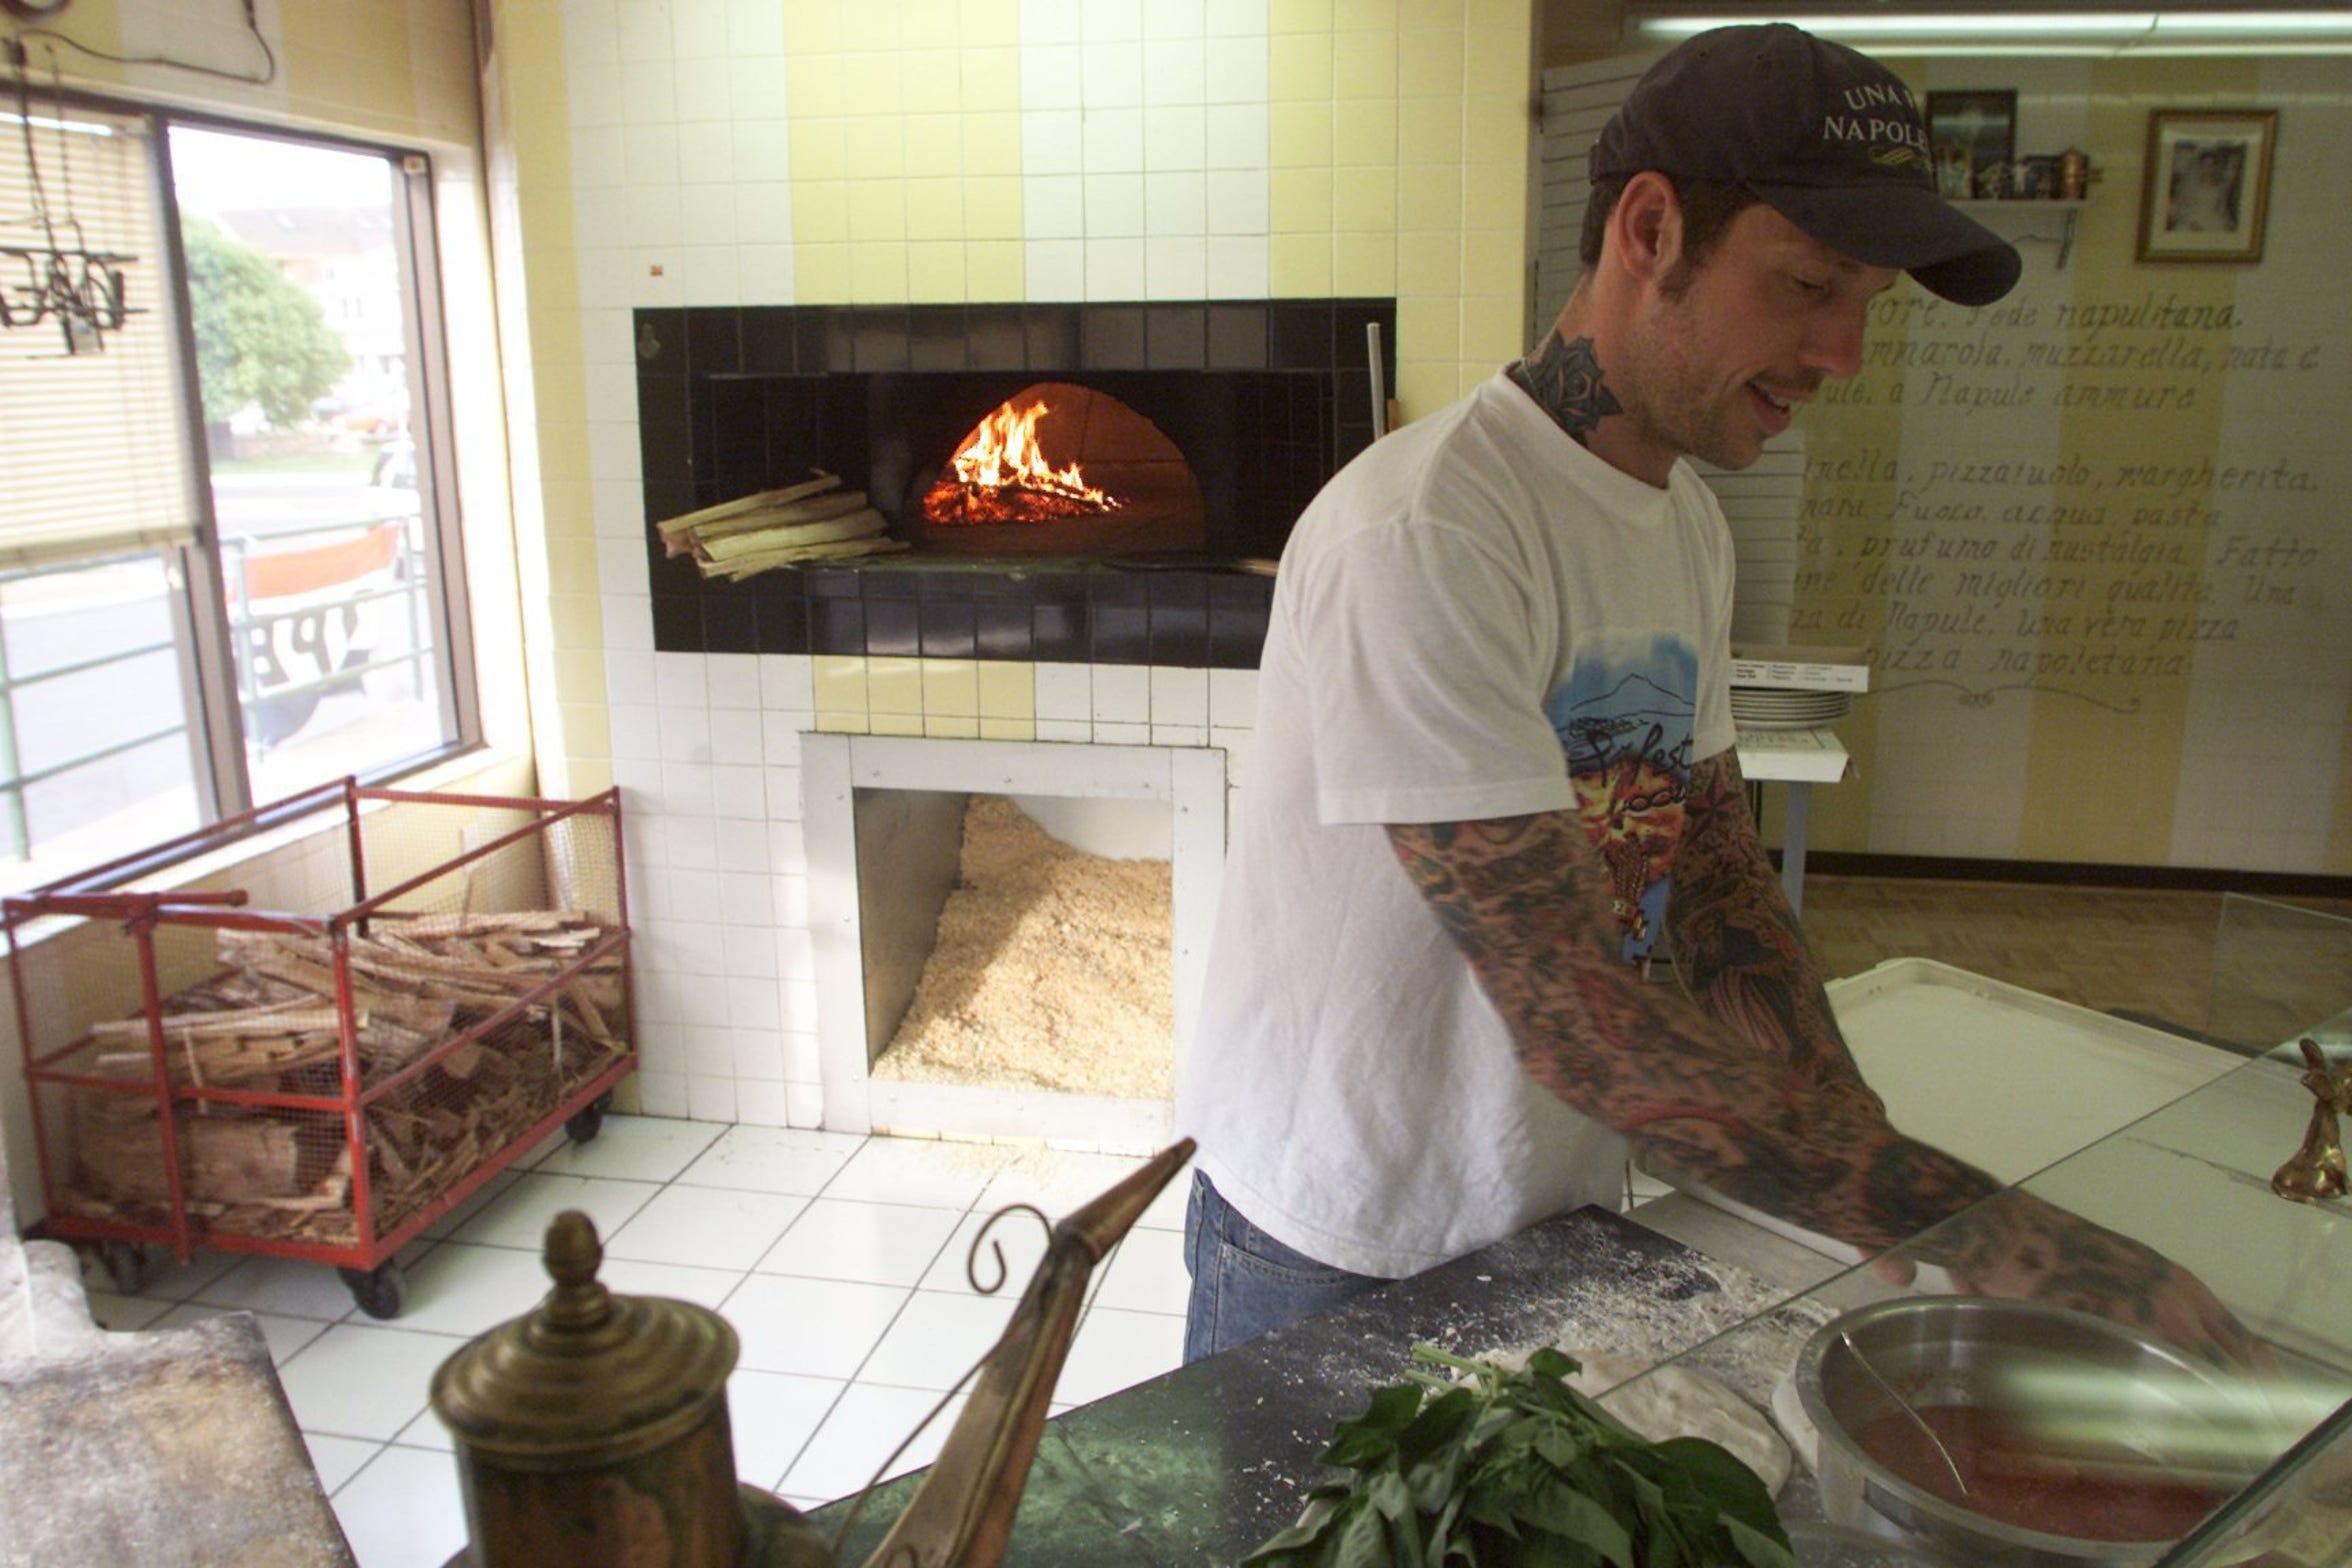 Anthony Mangieri in his first Una Pizza Napoletana restaurant in Point Pleasant Beach in 2003.